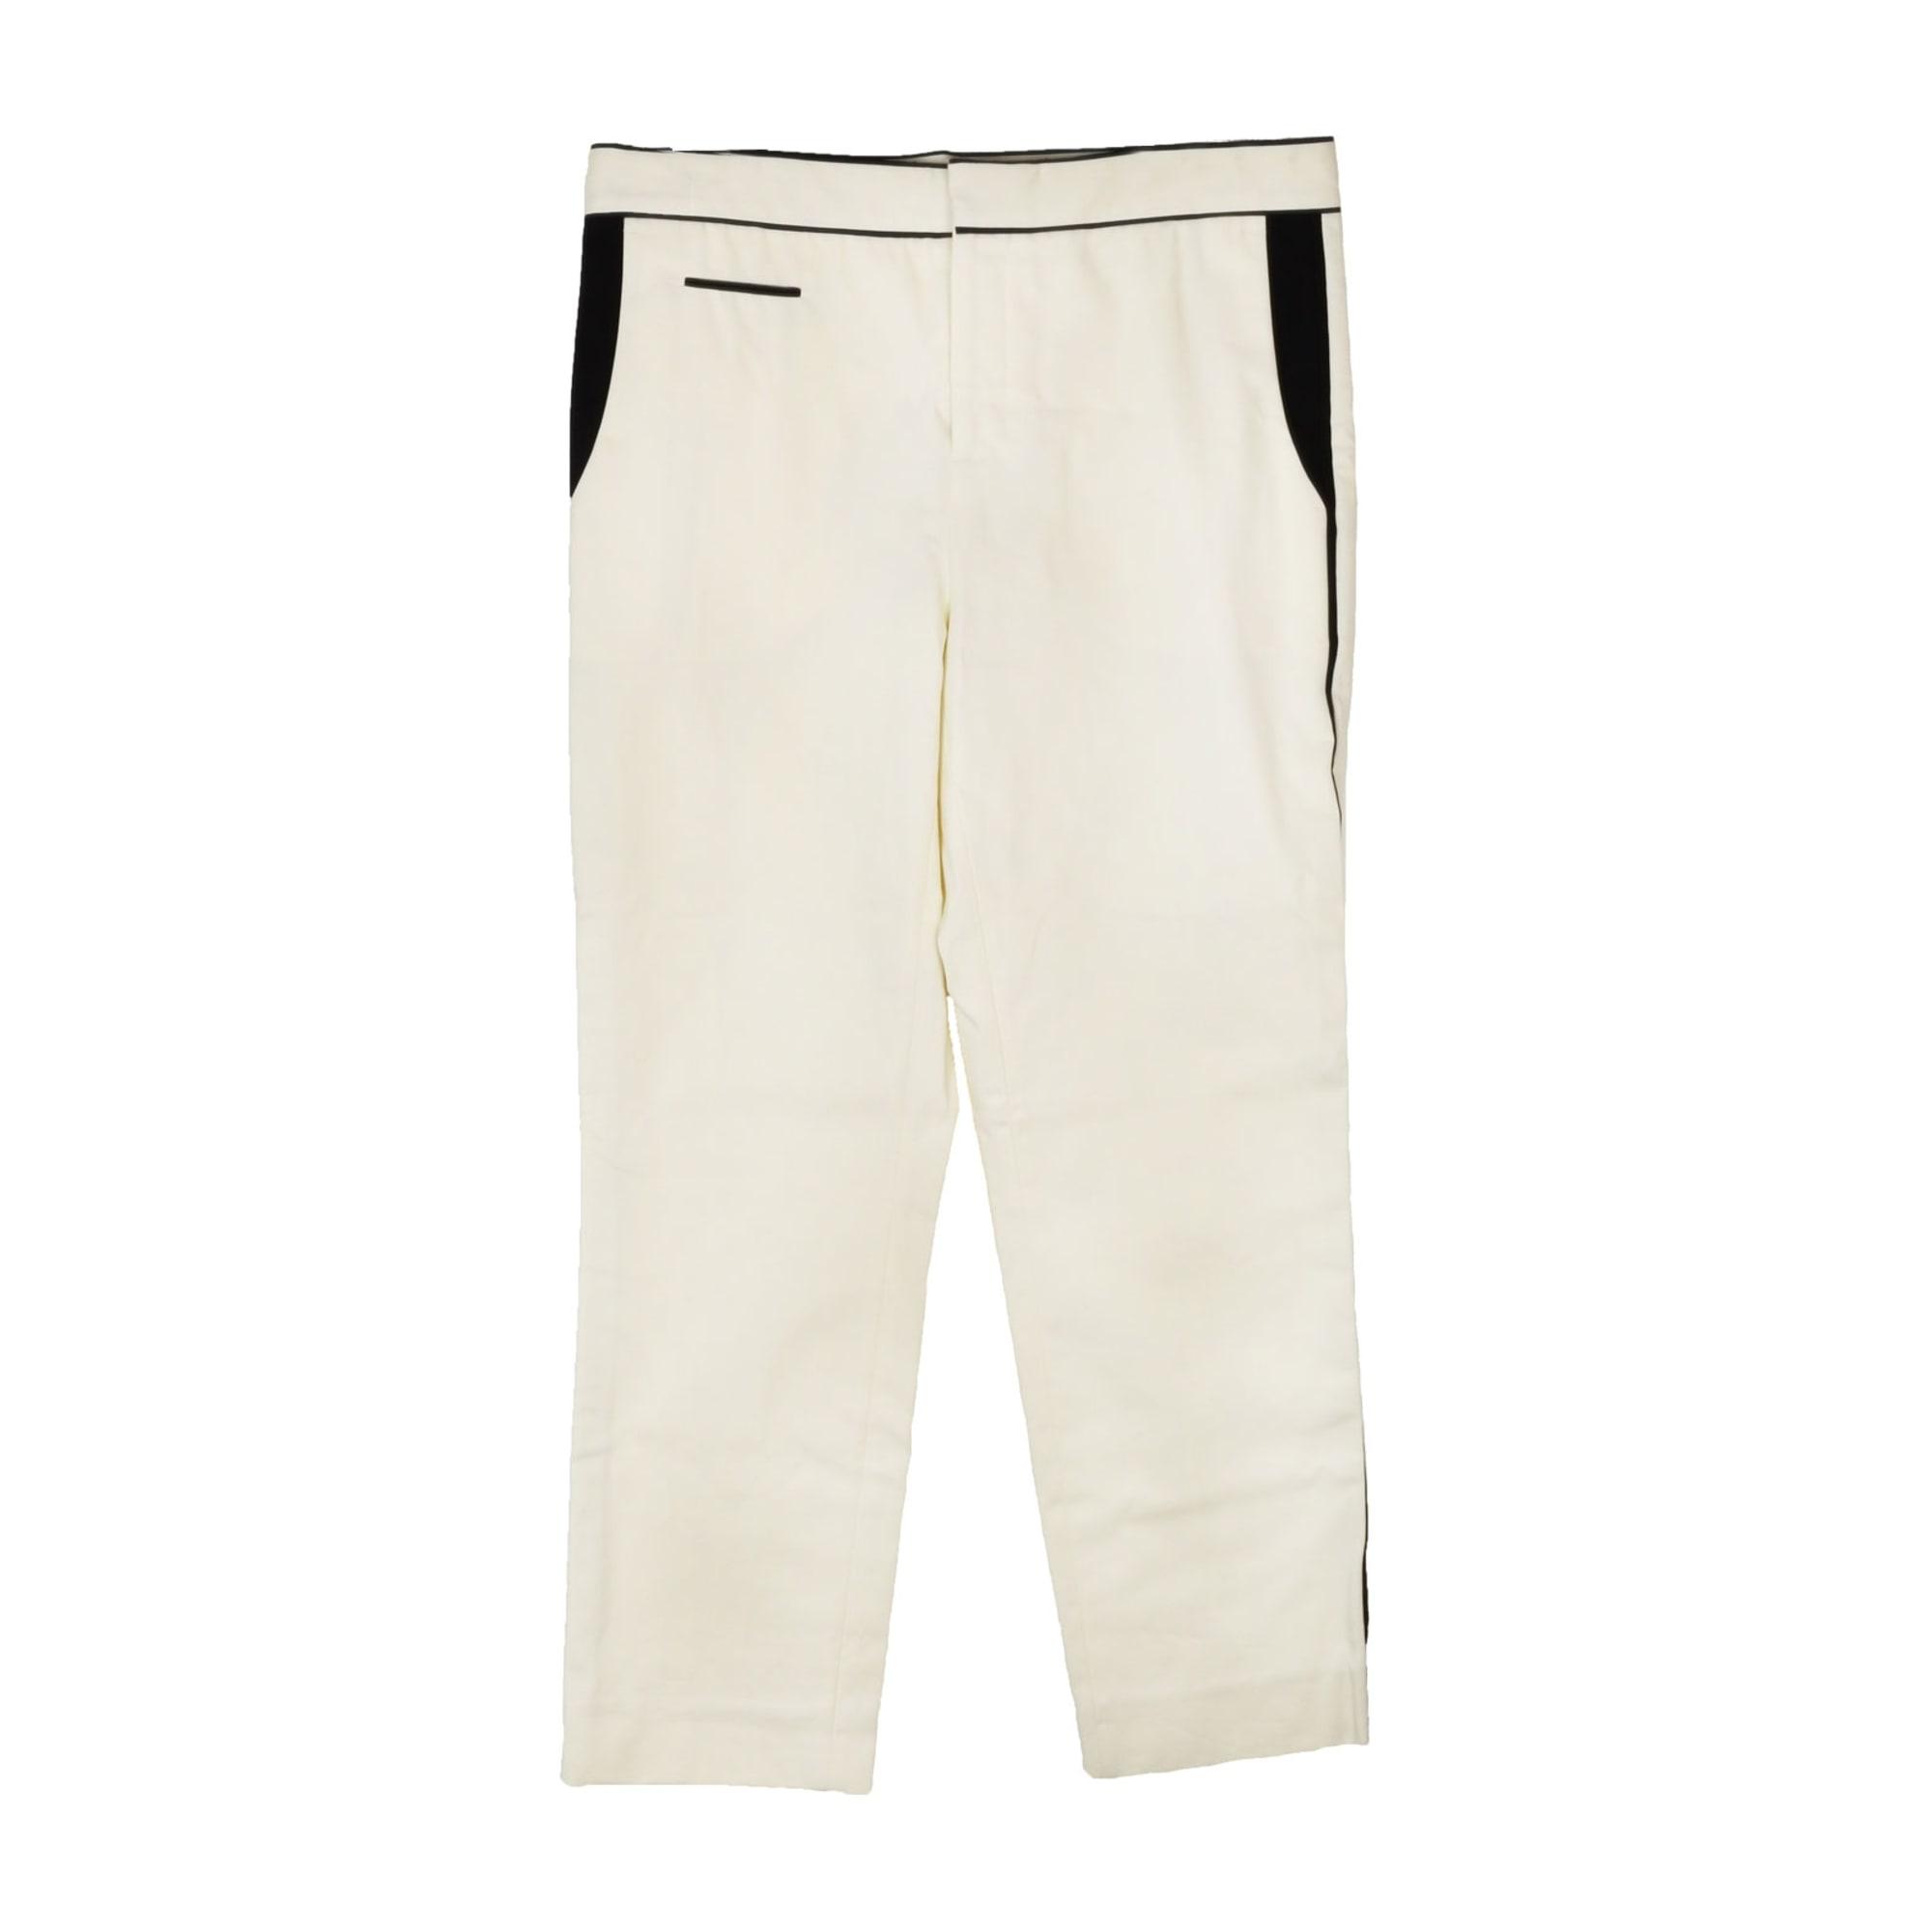 Pantalon large MARNI Beige, camel